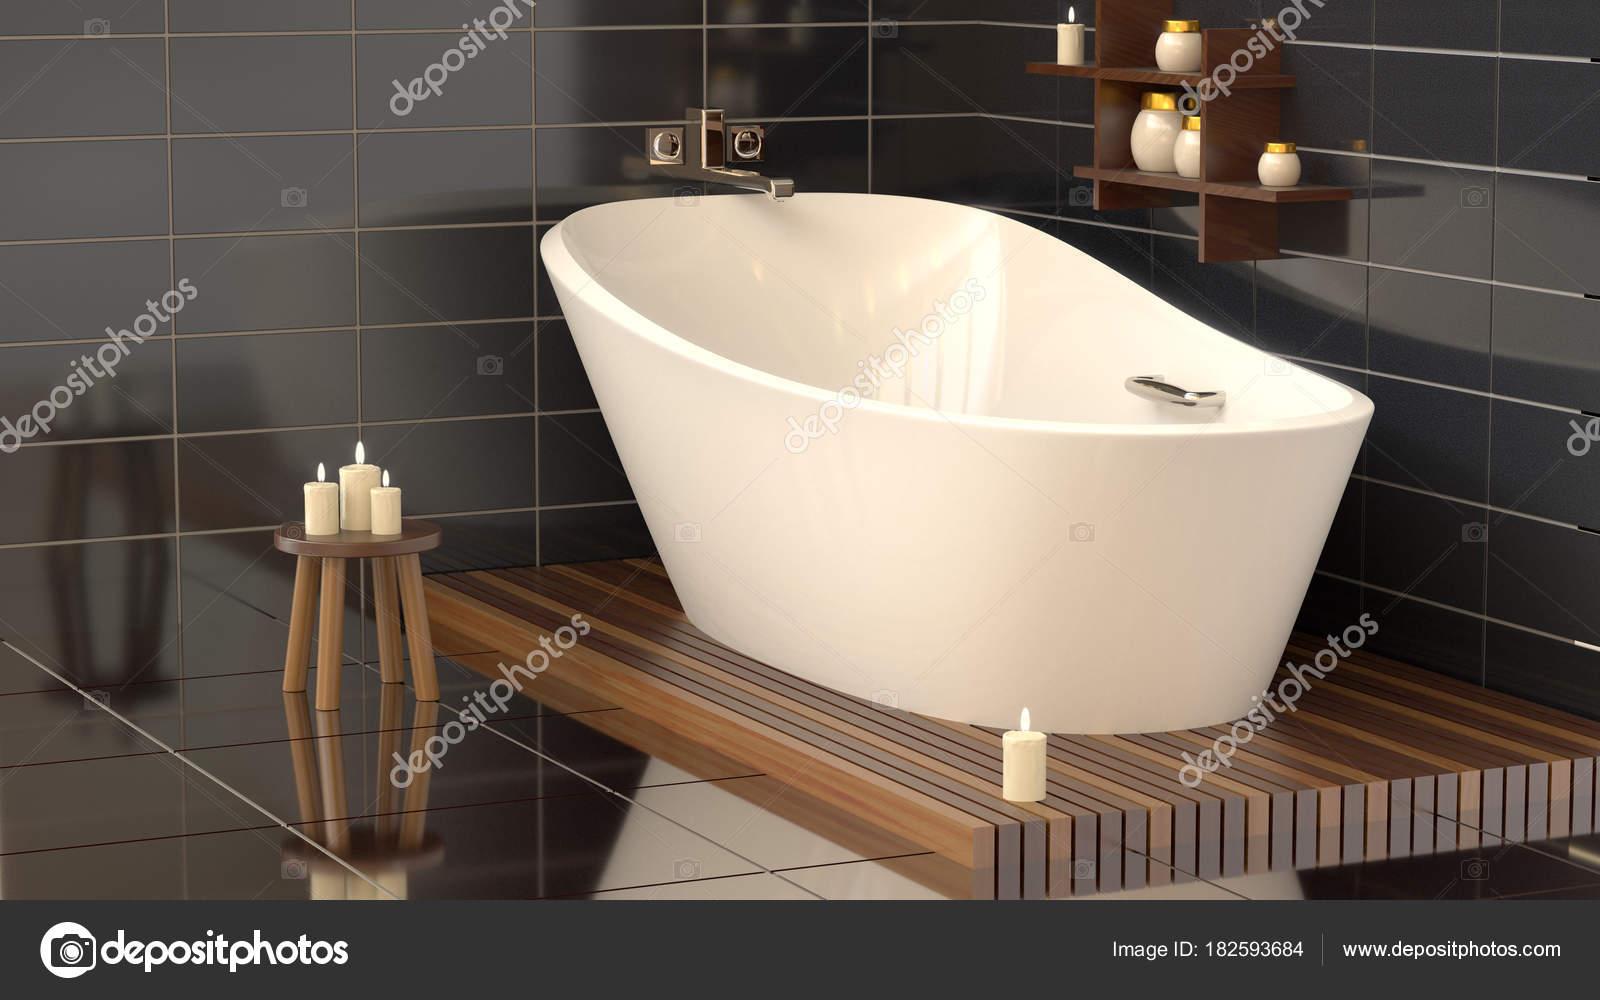 keramik badewanne gallery of badewanne keramik tonic ii by ideal standard wohndesign albrecht. Black Bedroom Furniture Sets. Home Design Ideas